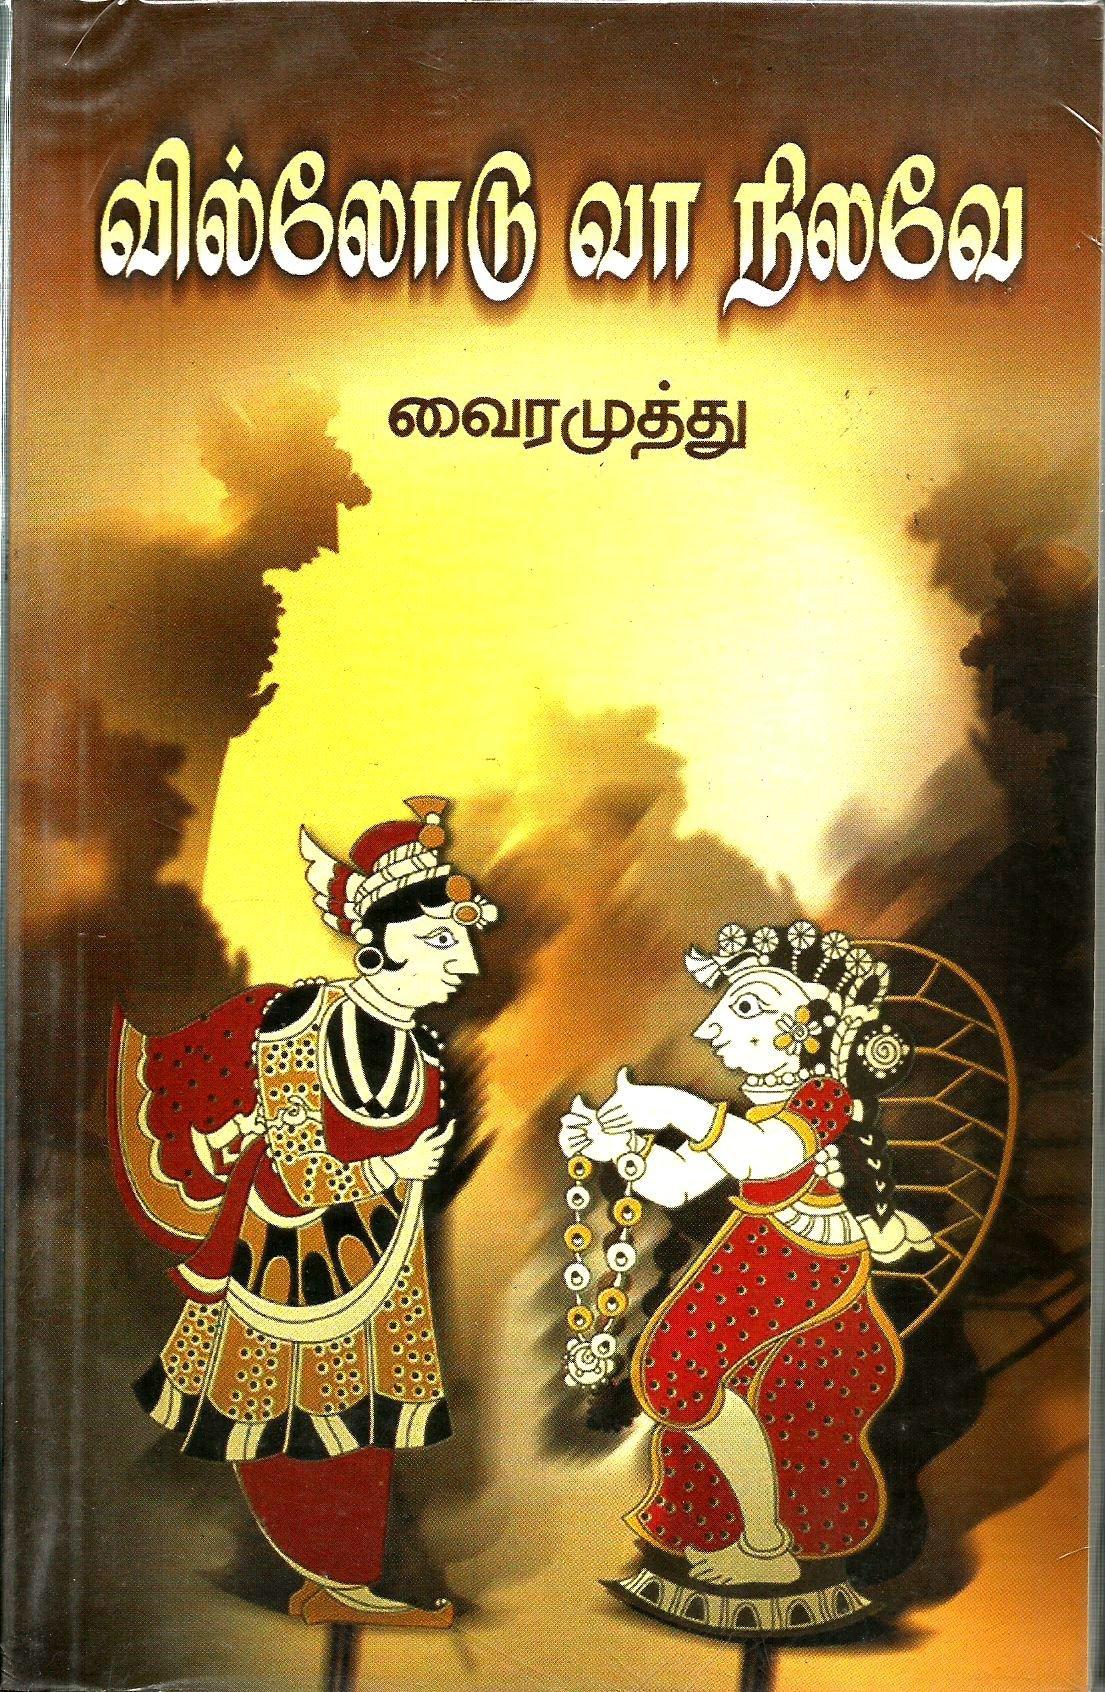 Moondram Ulaga Por Tamil Pdf